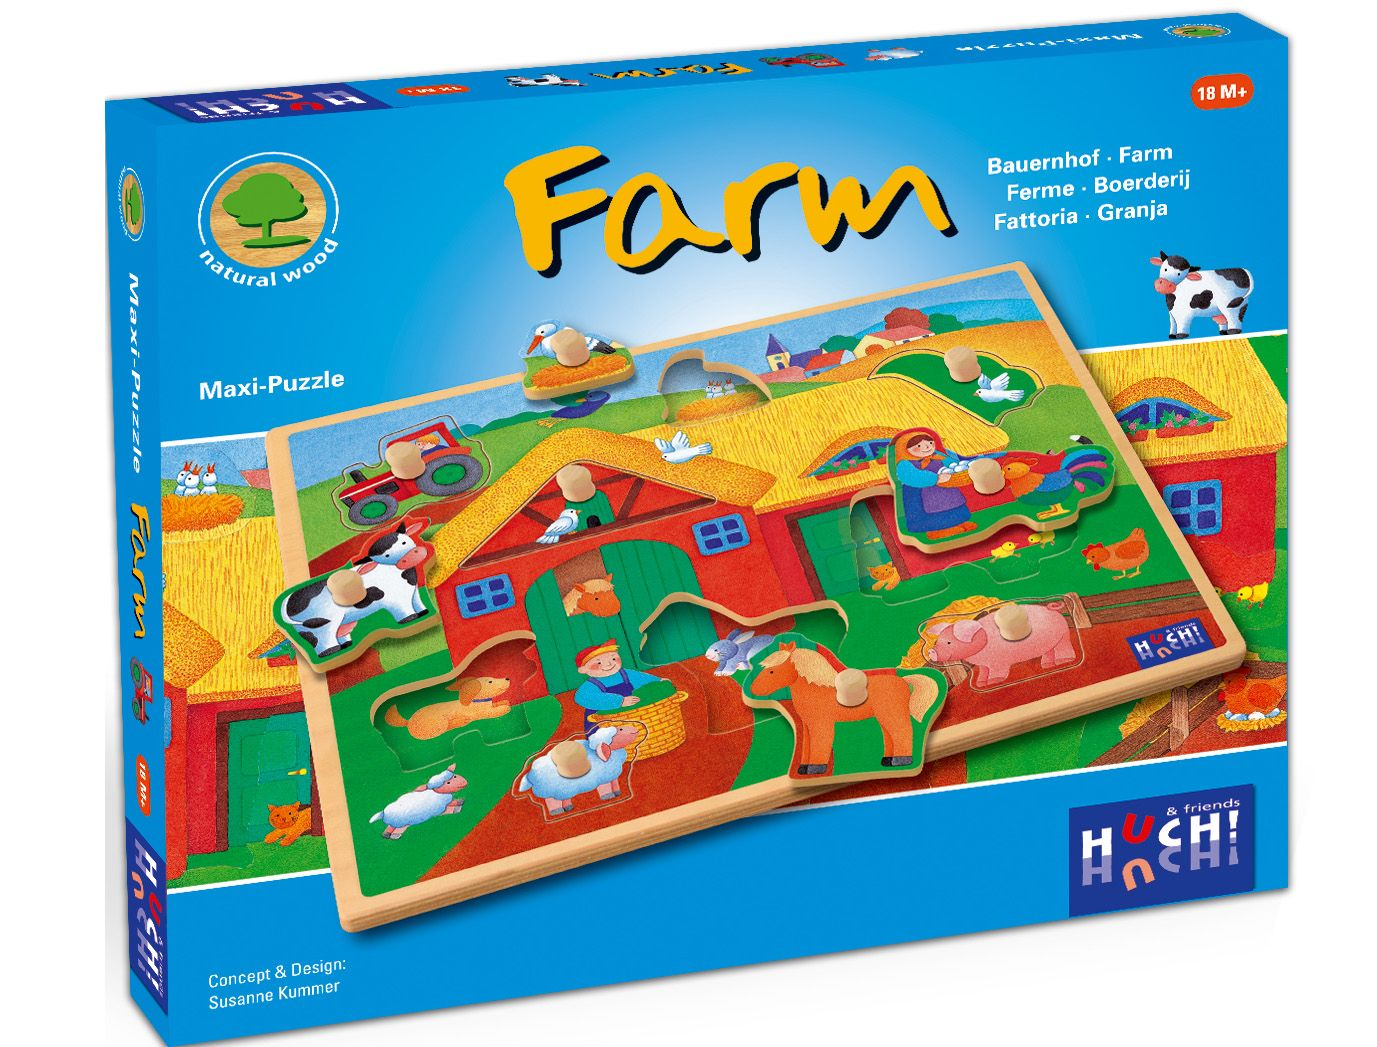 HUCH FRIENDS Huch! & friends Puzzle, 9 Maxi-Teile, »Wooden Line Farm«